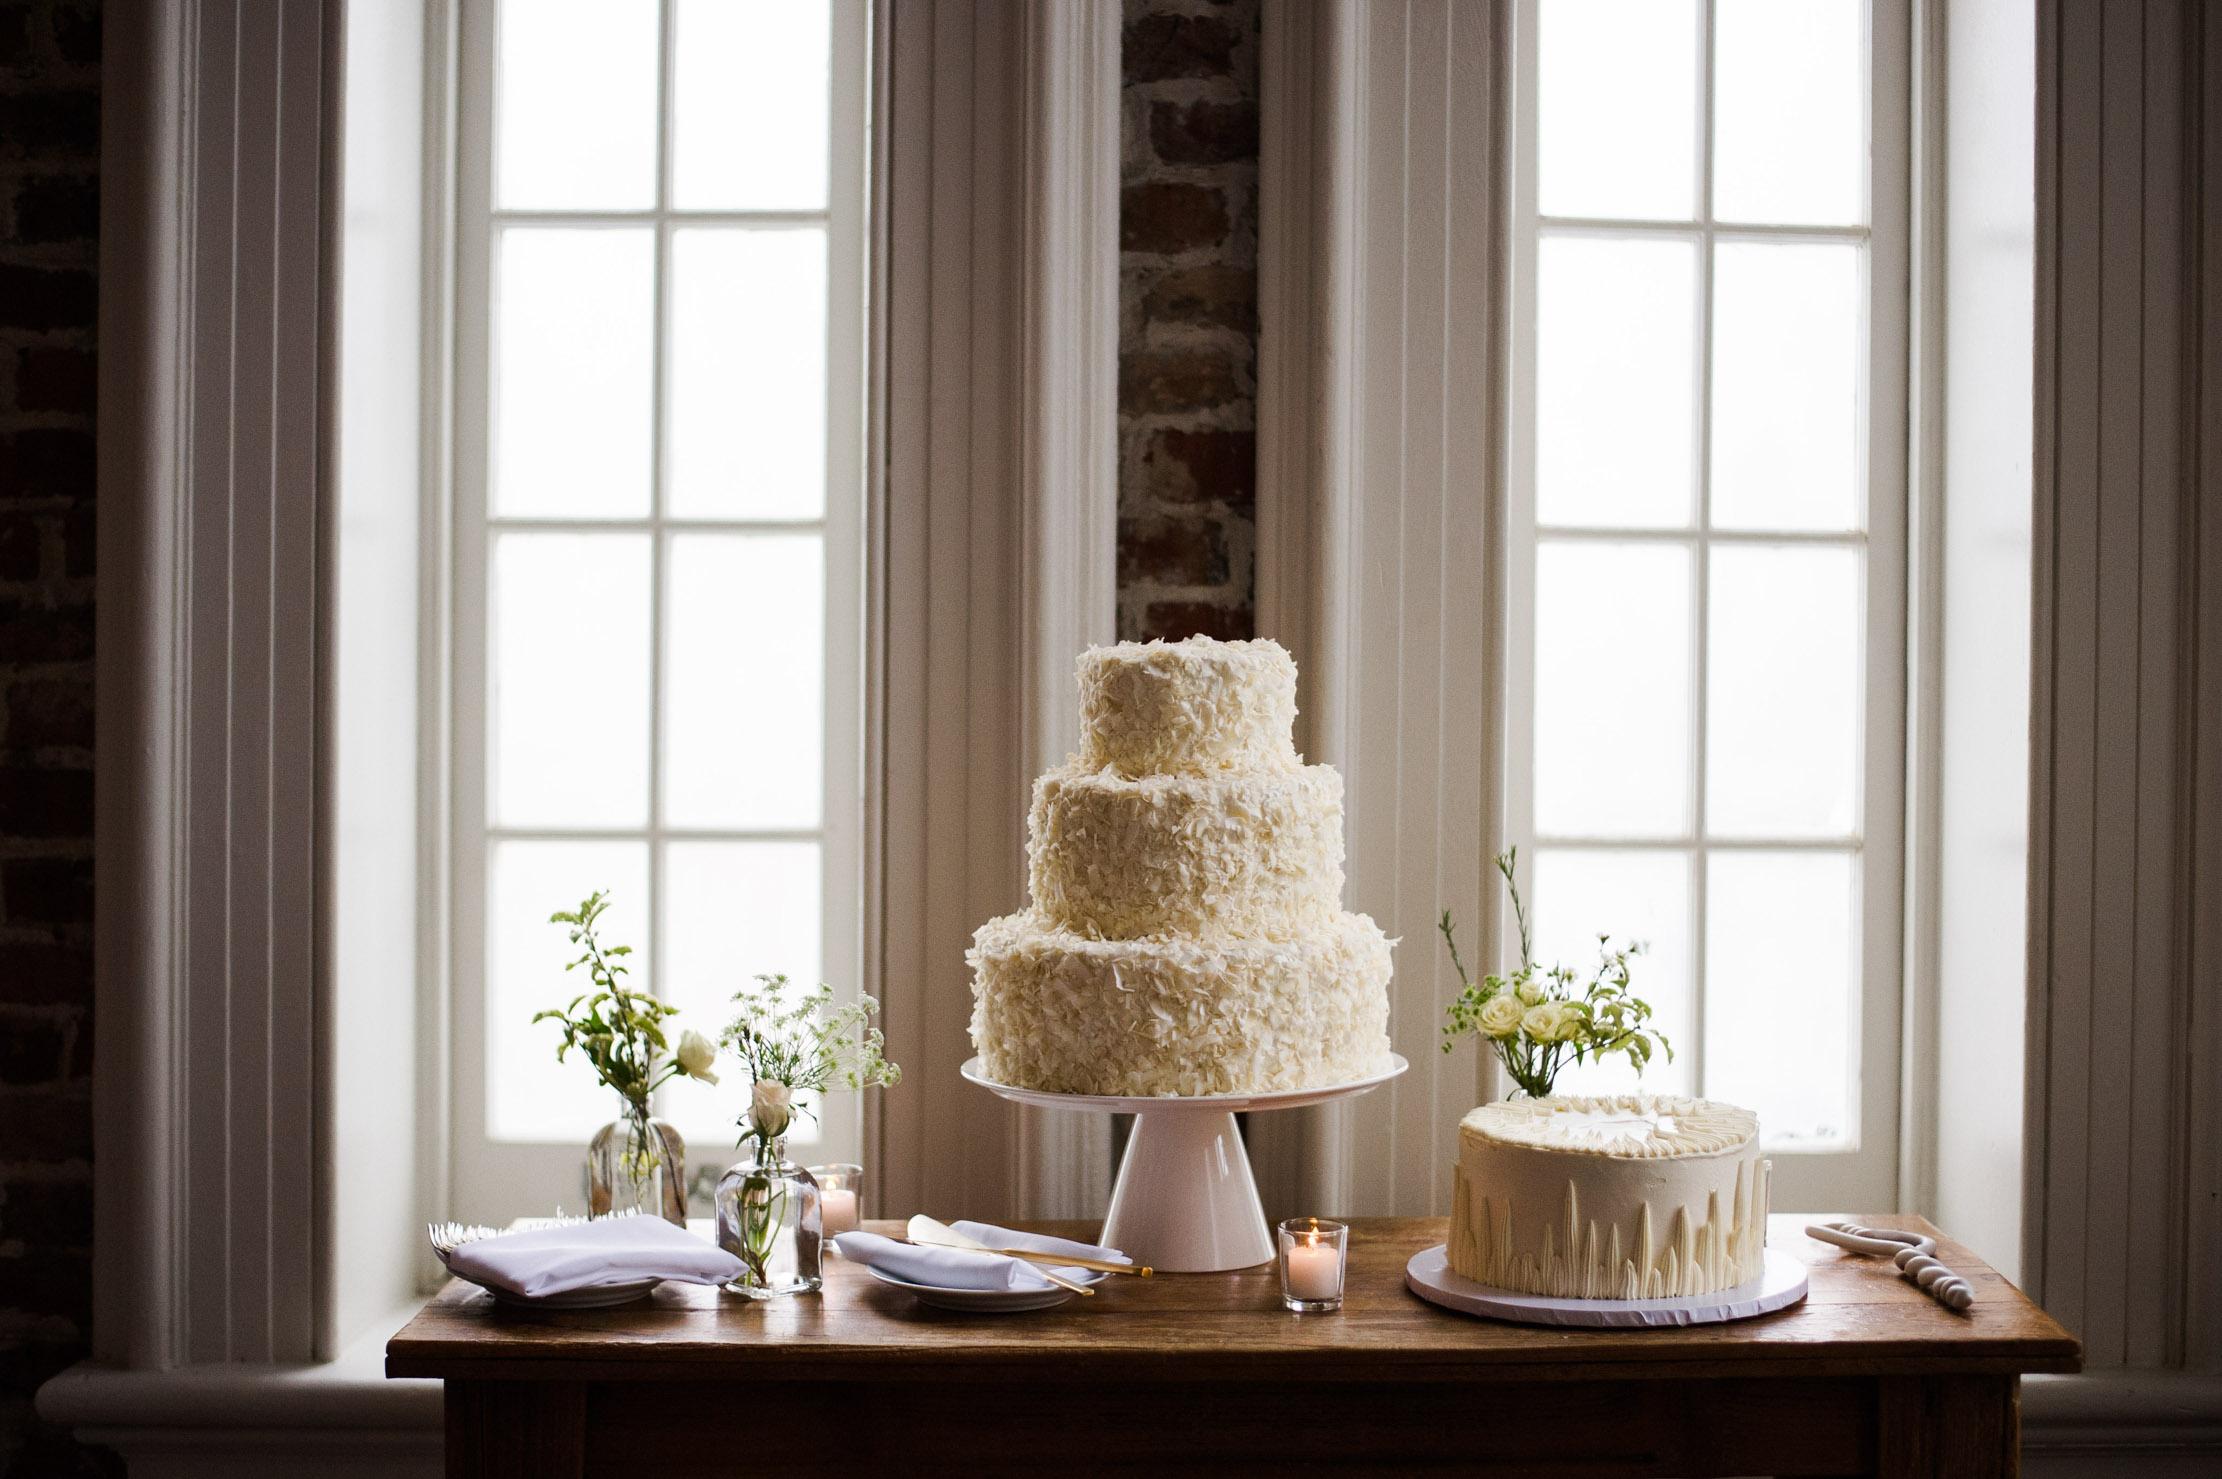 NOLA-Felicity-Church-Ace-Hotel-Wedding-1057.jpg